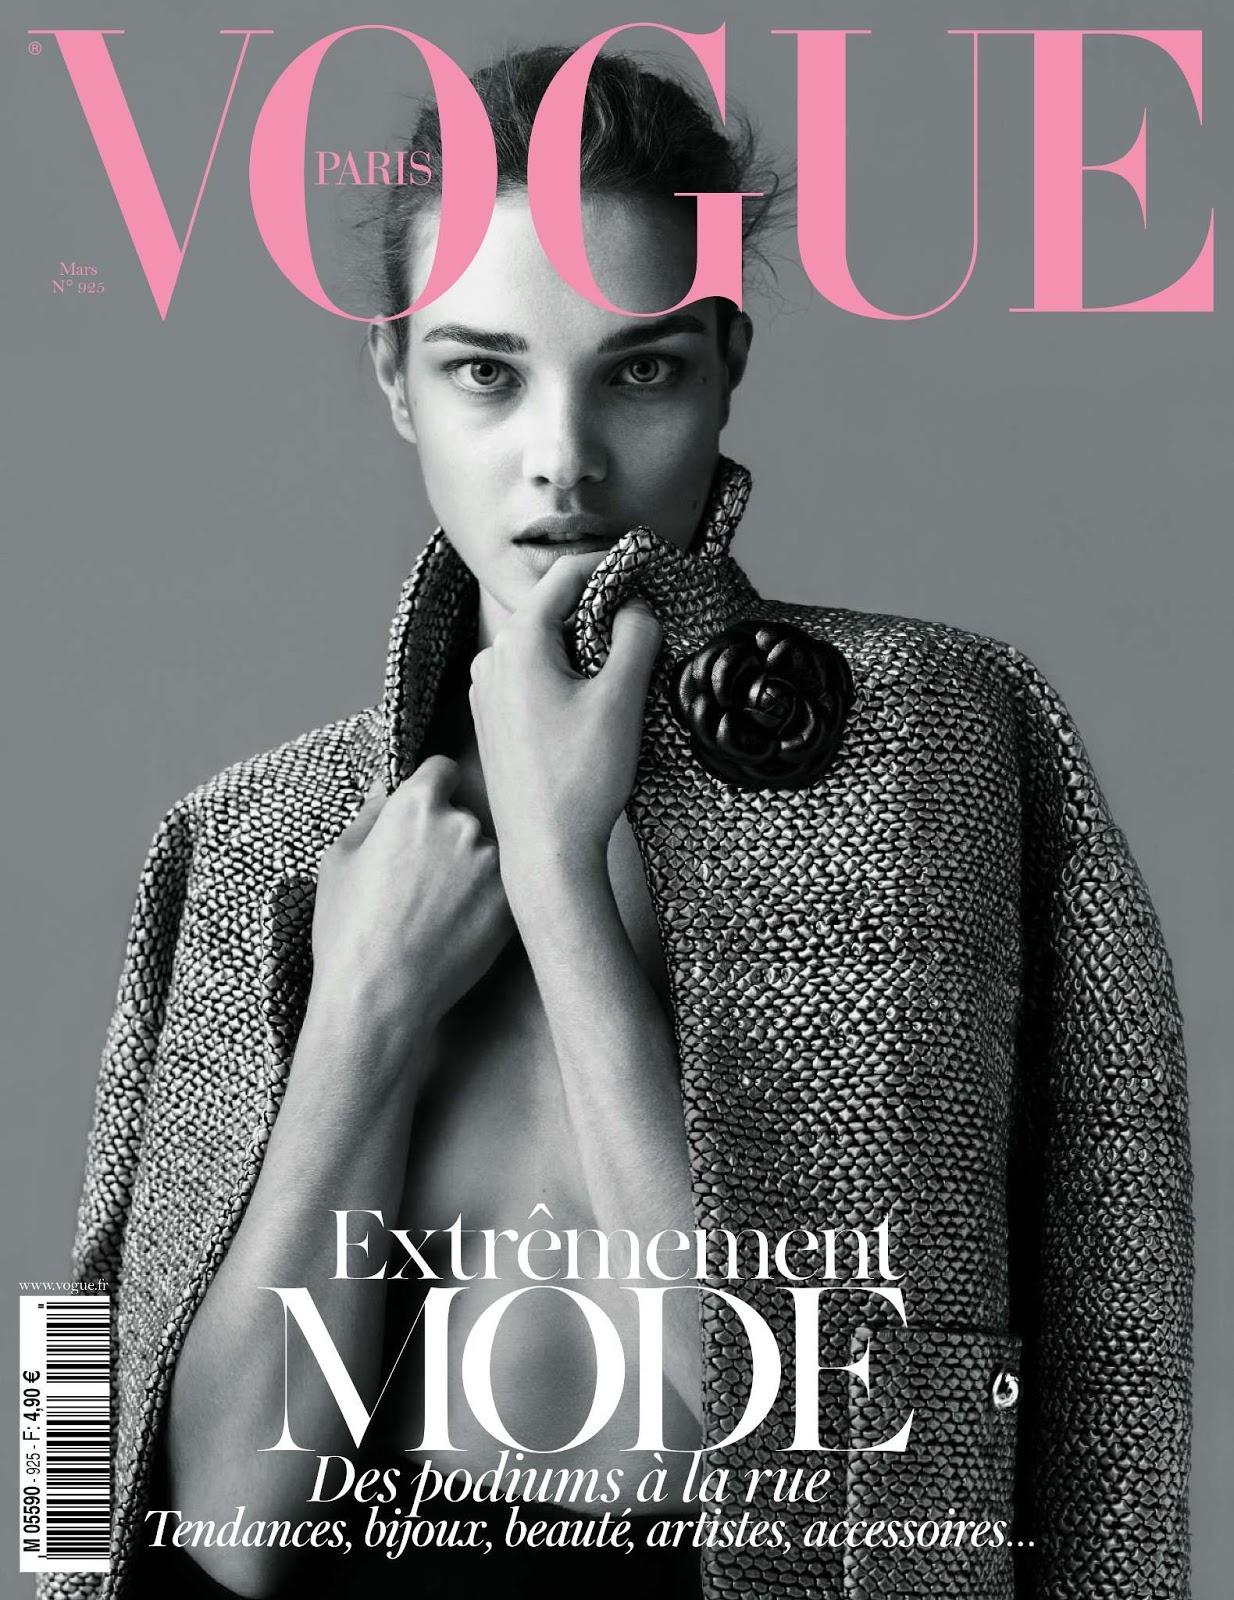 Vogue Magazine Subscription: Vogue's Covers: Natalia Vodianova